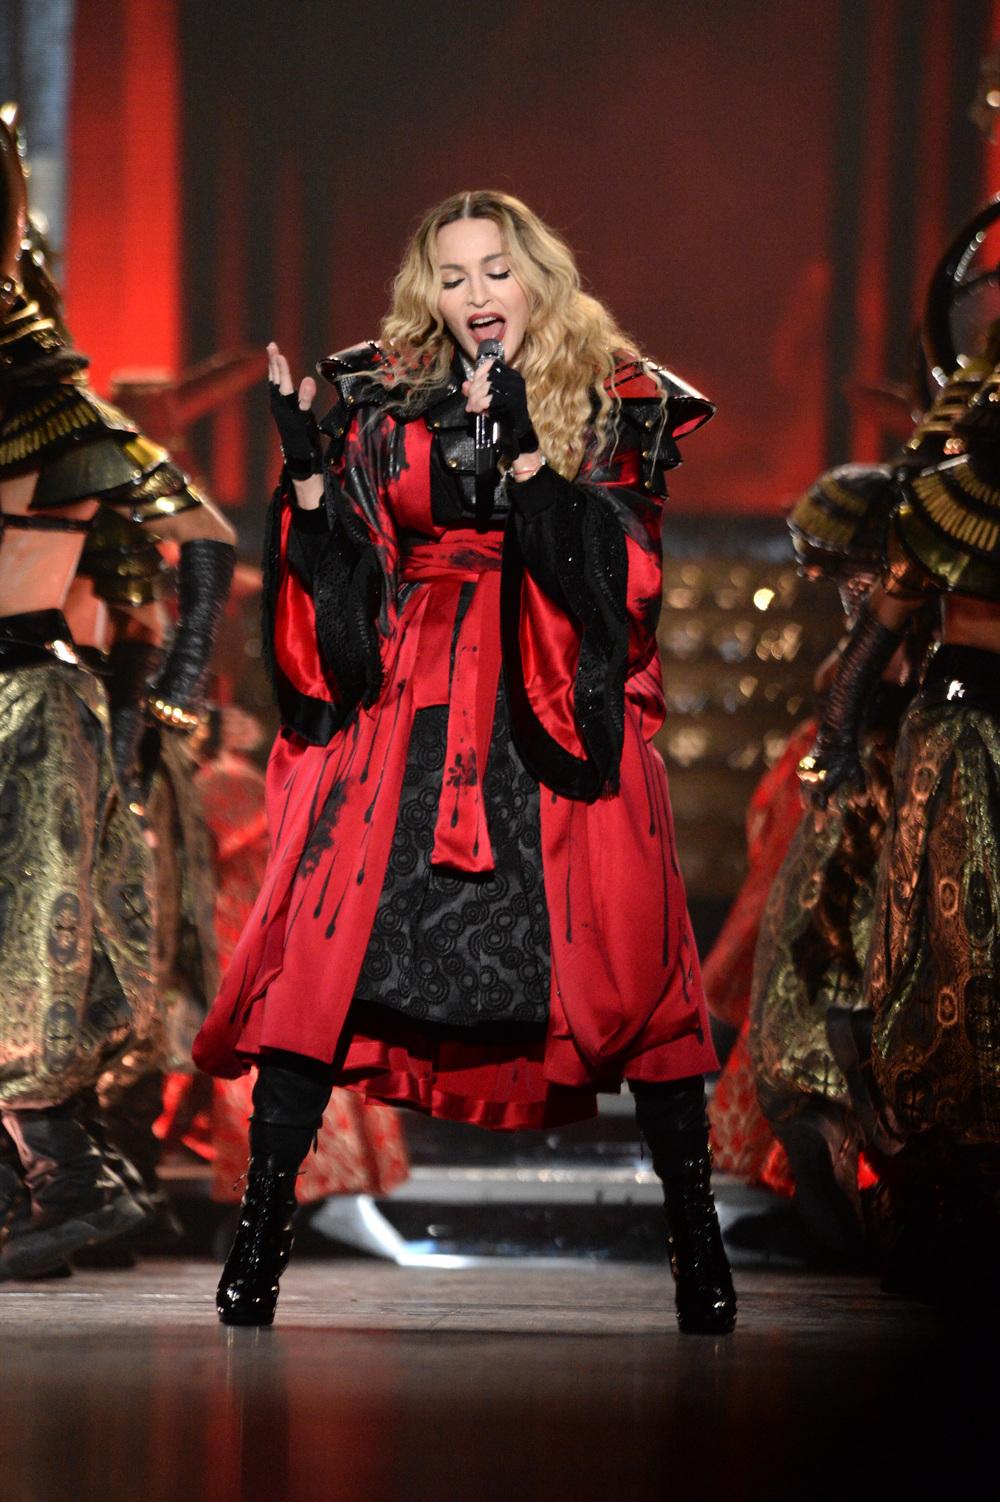 576711507LL029_Madonna_Rebe.JPG